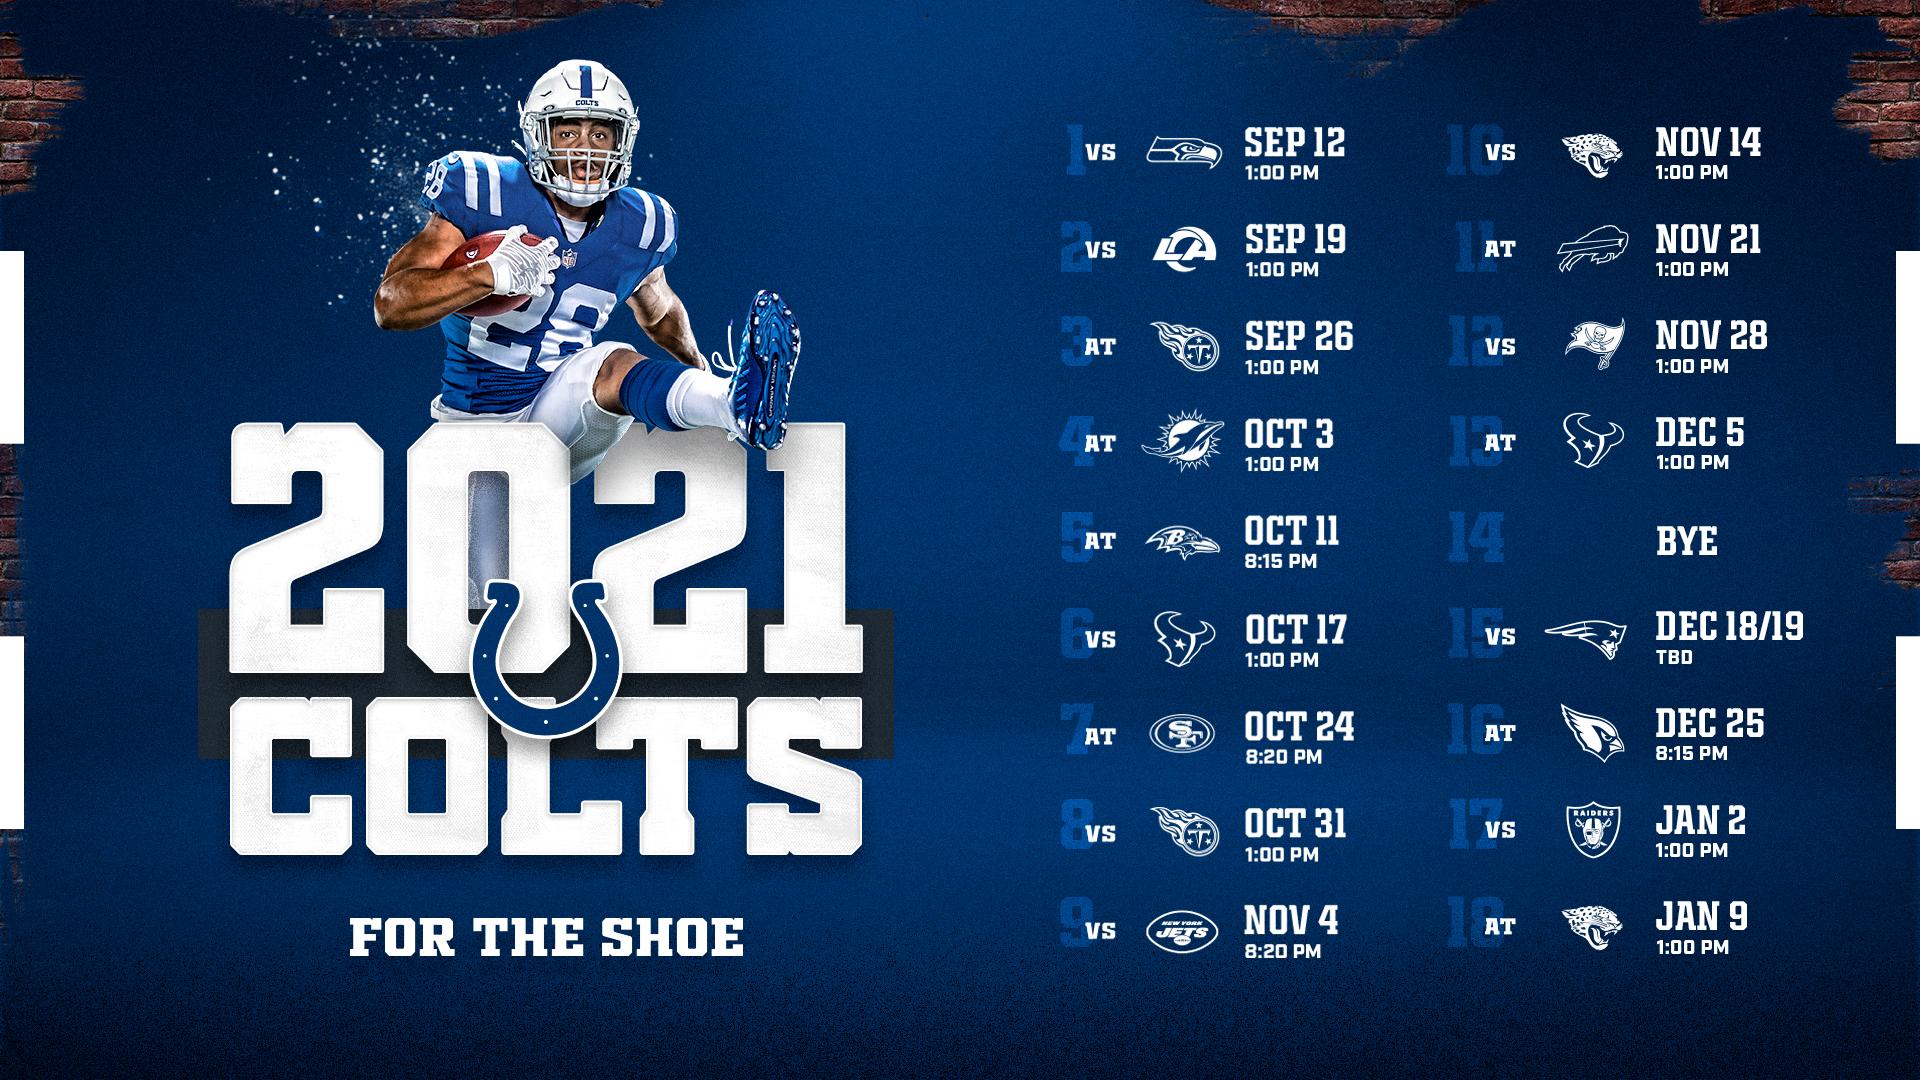 Colts Schedule | Indianapolis Colts - colts.com